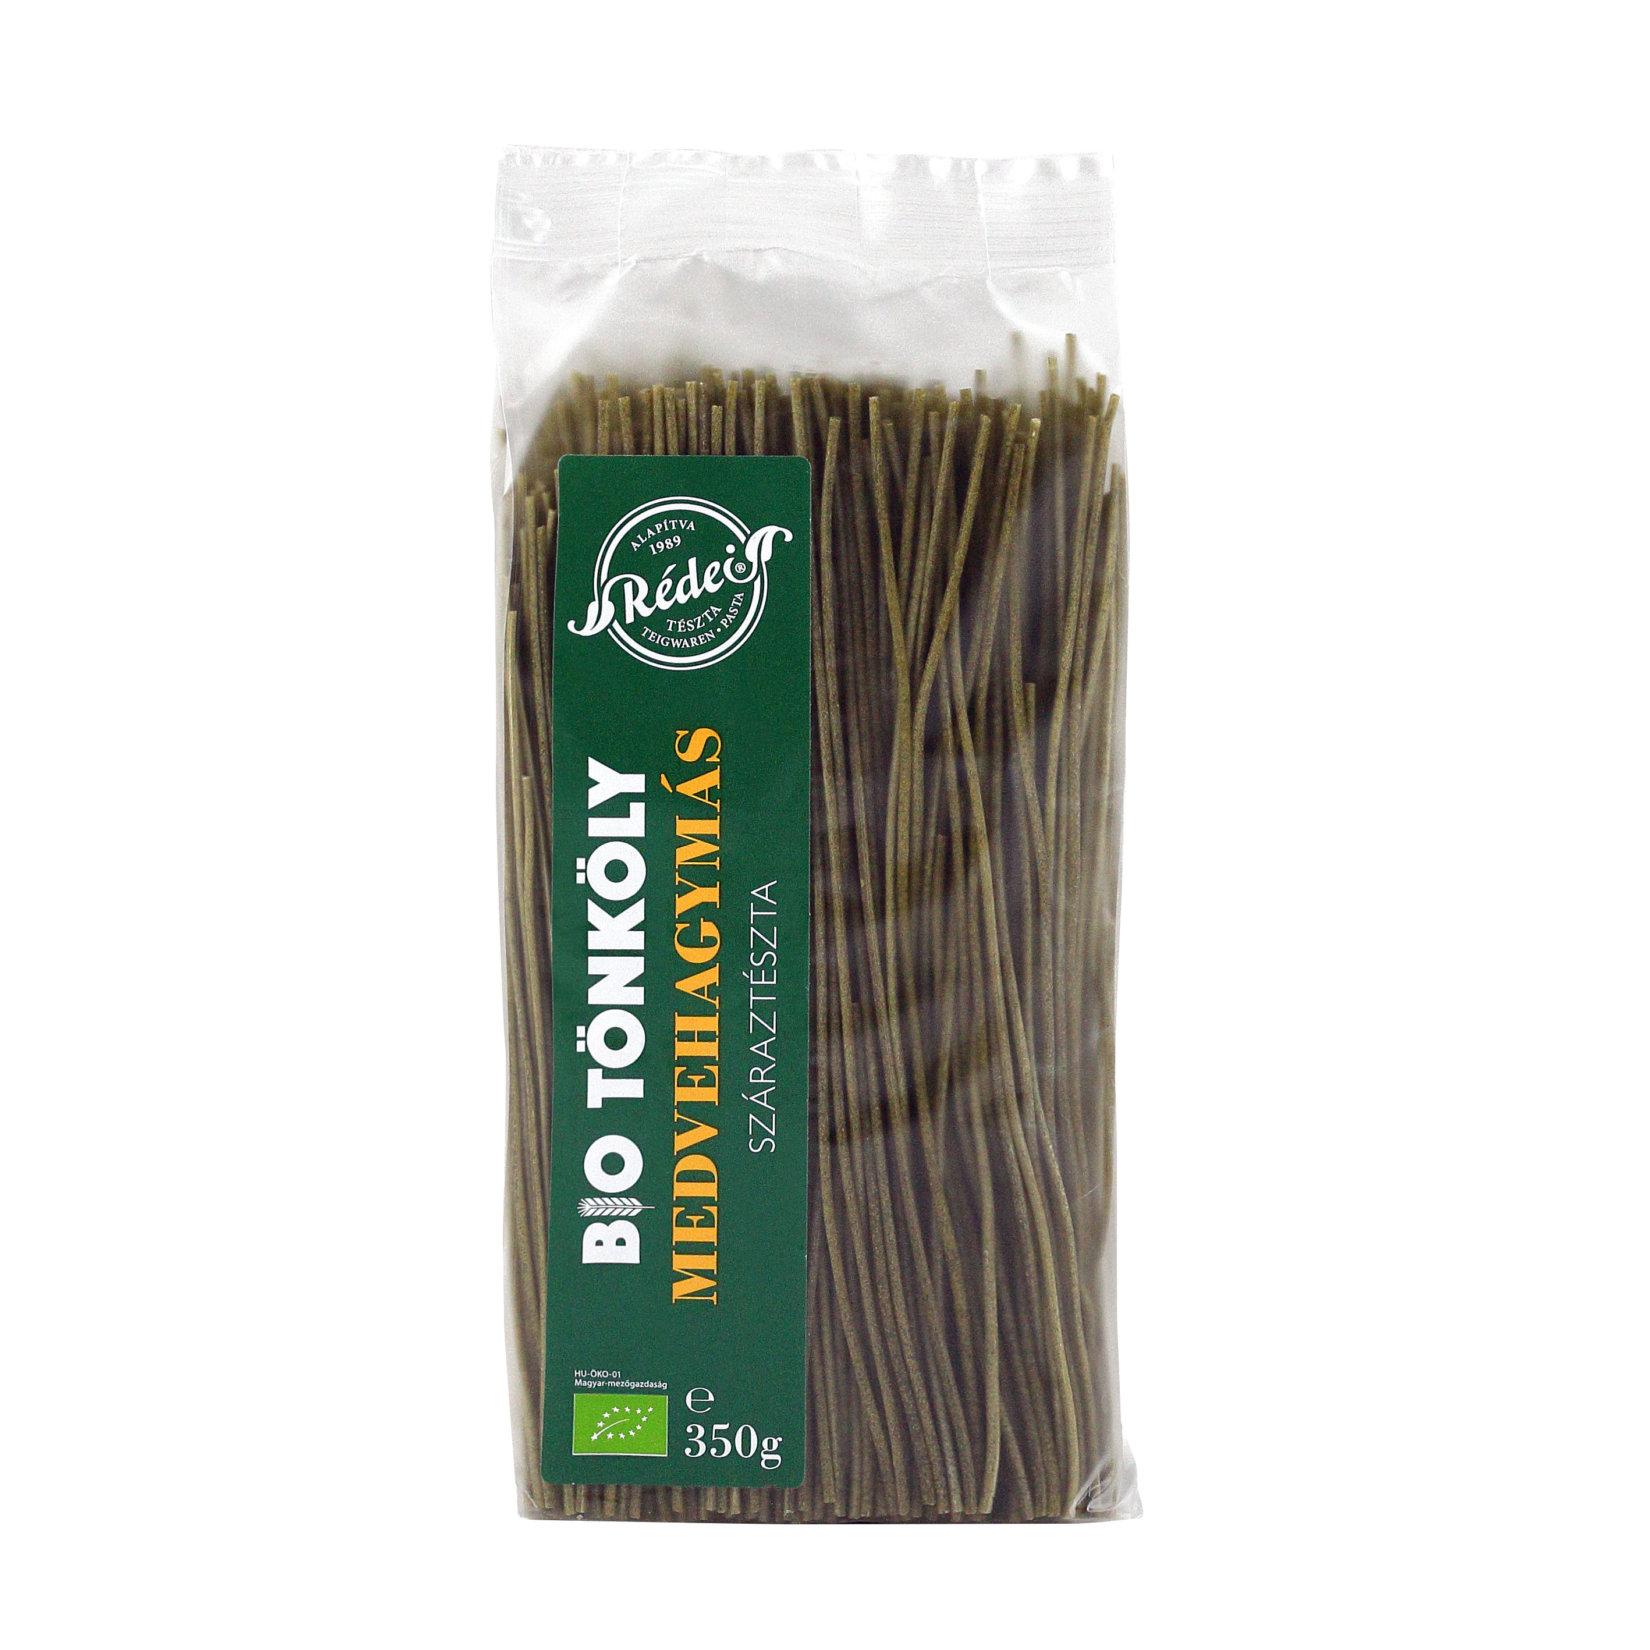 BioTonkoly_Medveh spagetti_350g_IMG_7014